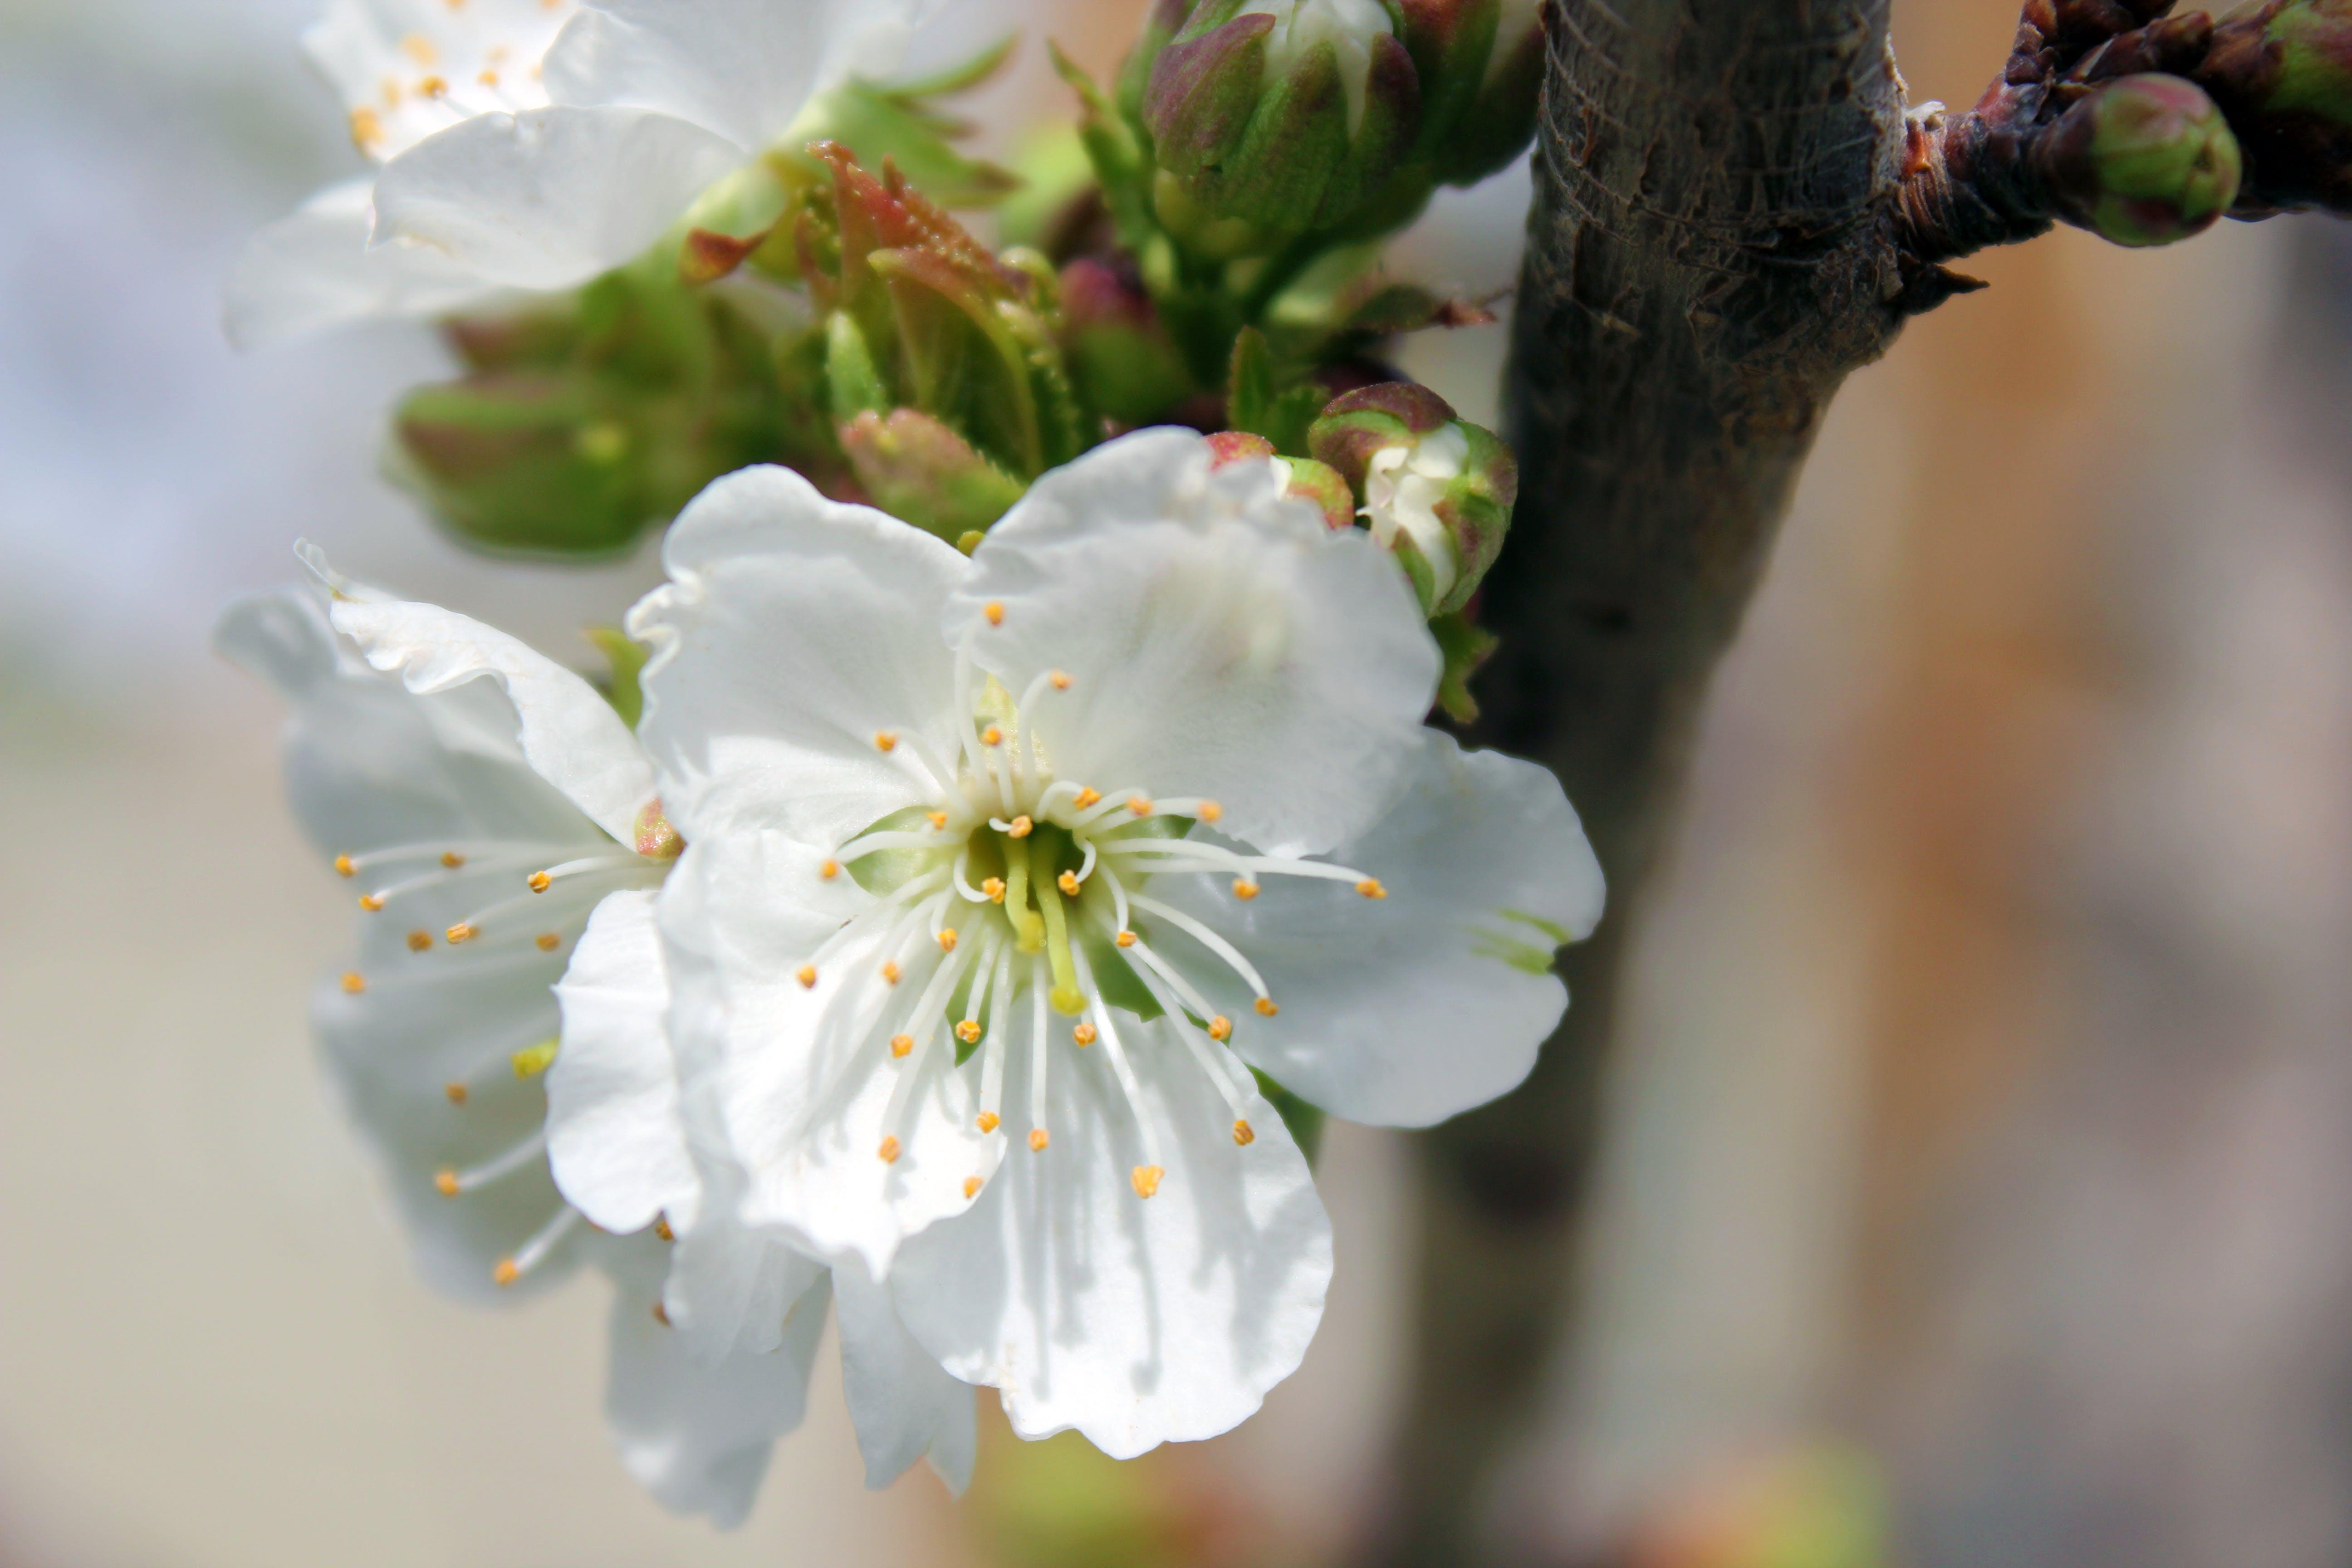 Free stock photo of white flowers, cherry tree flowers